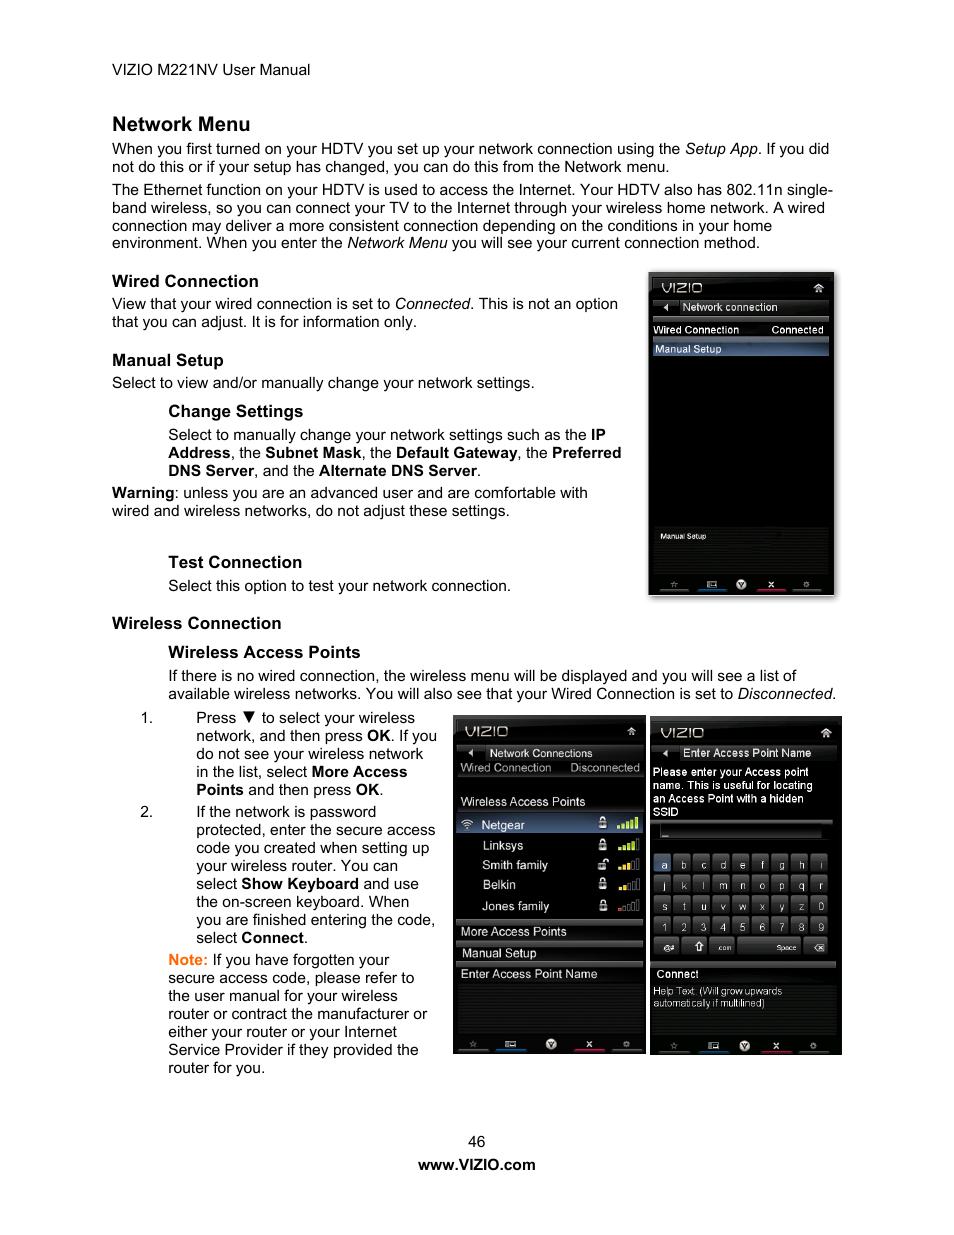 Network menu | Vizio M221NV User Manual | Page 46 / 60